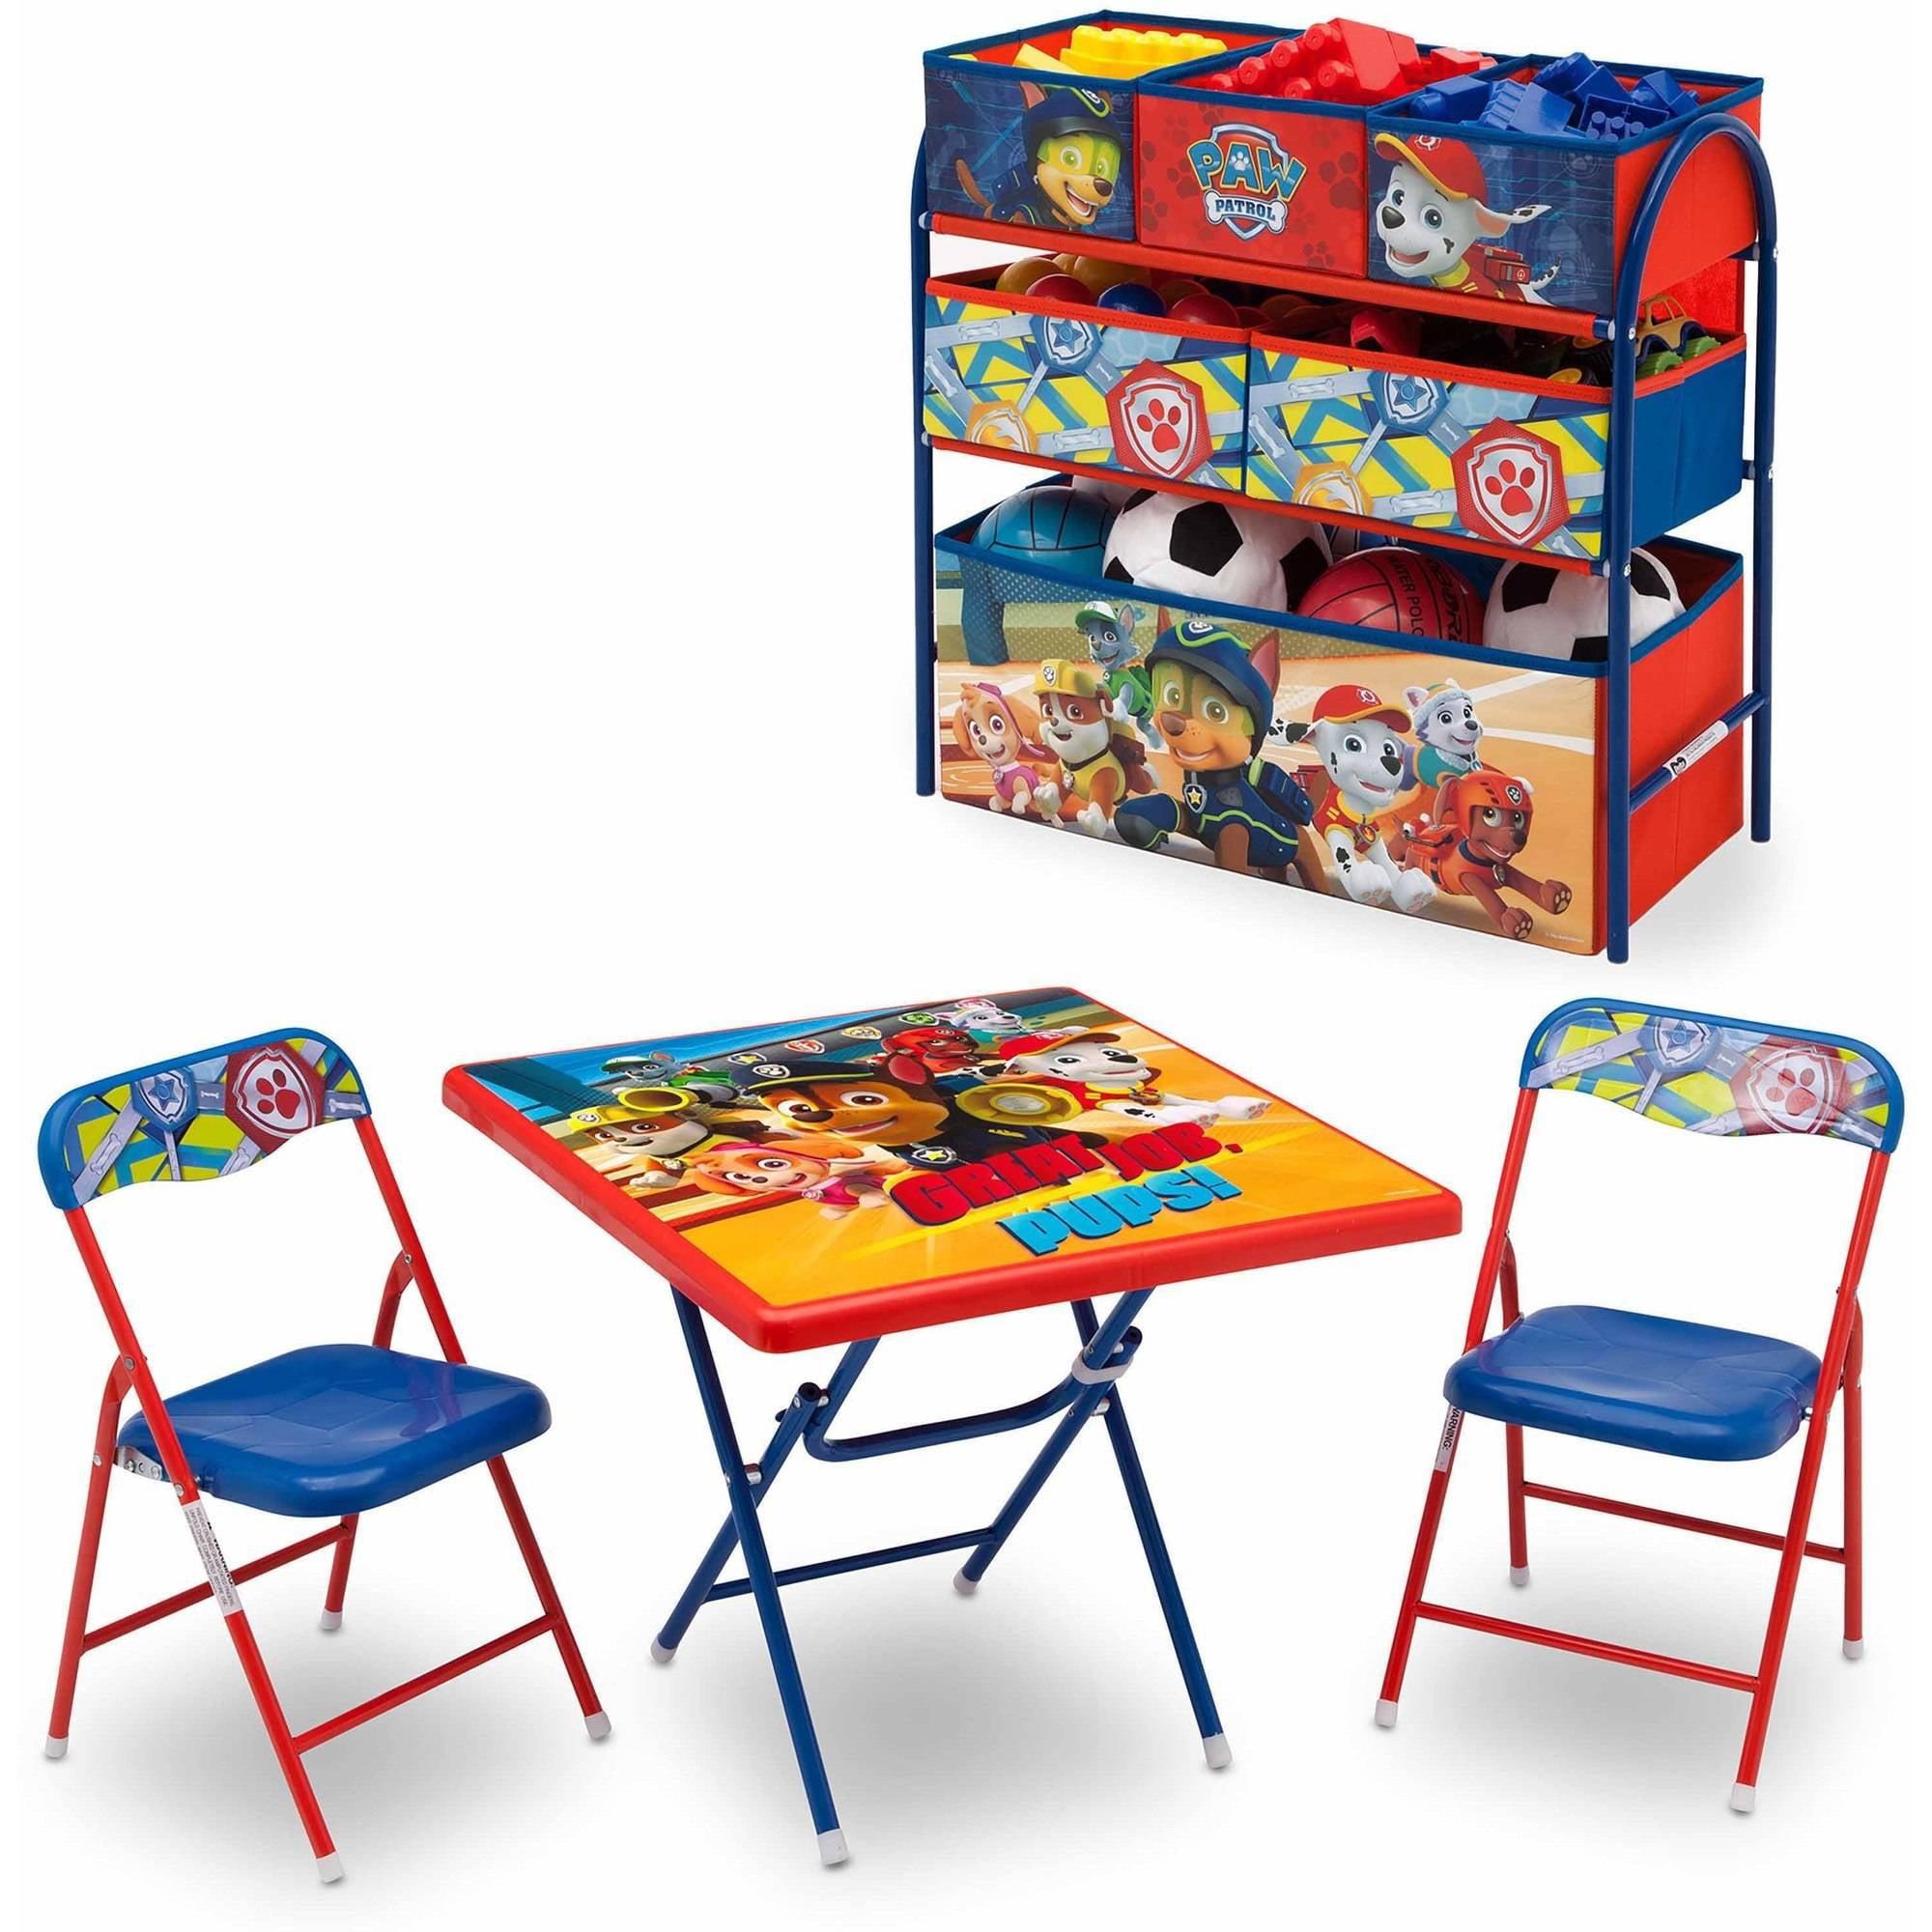 Nick Jr. Paw Patrol Playroom Solution by Delta Children